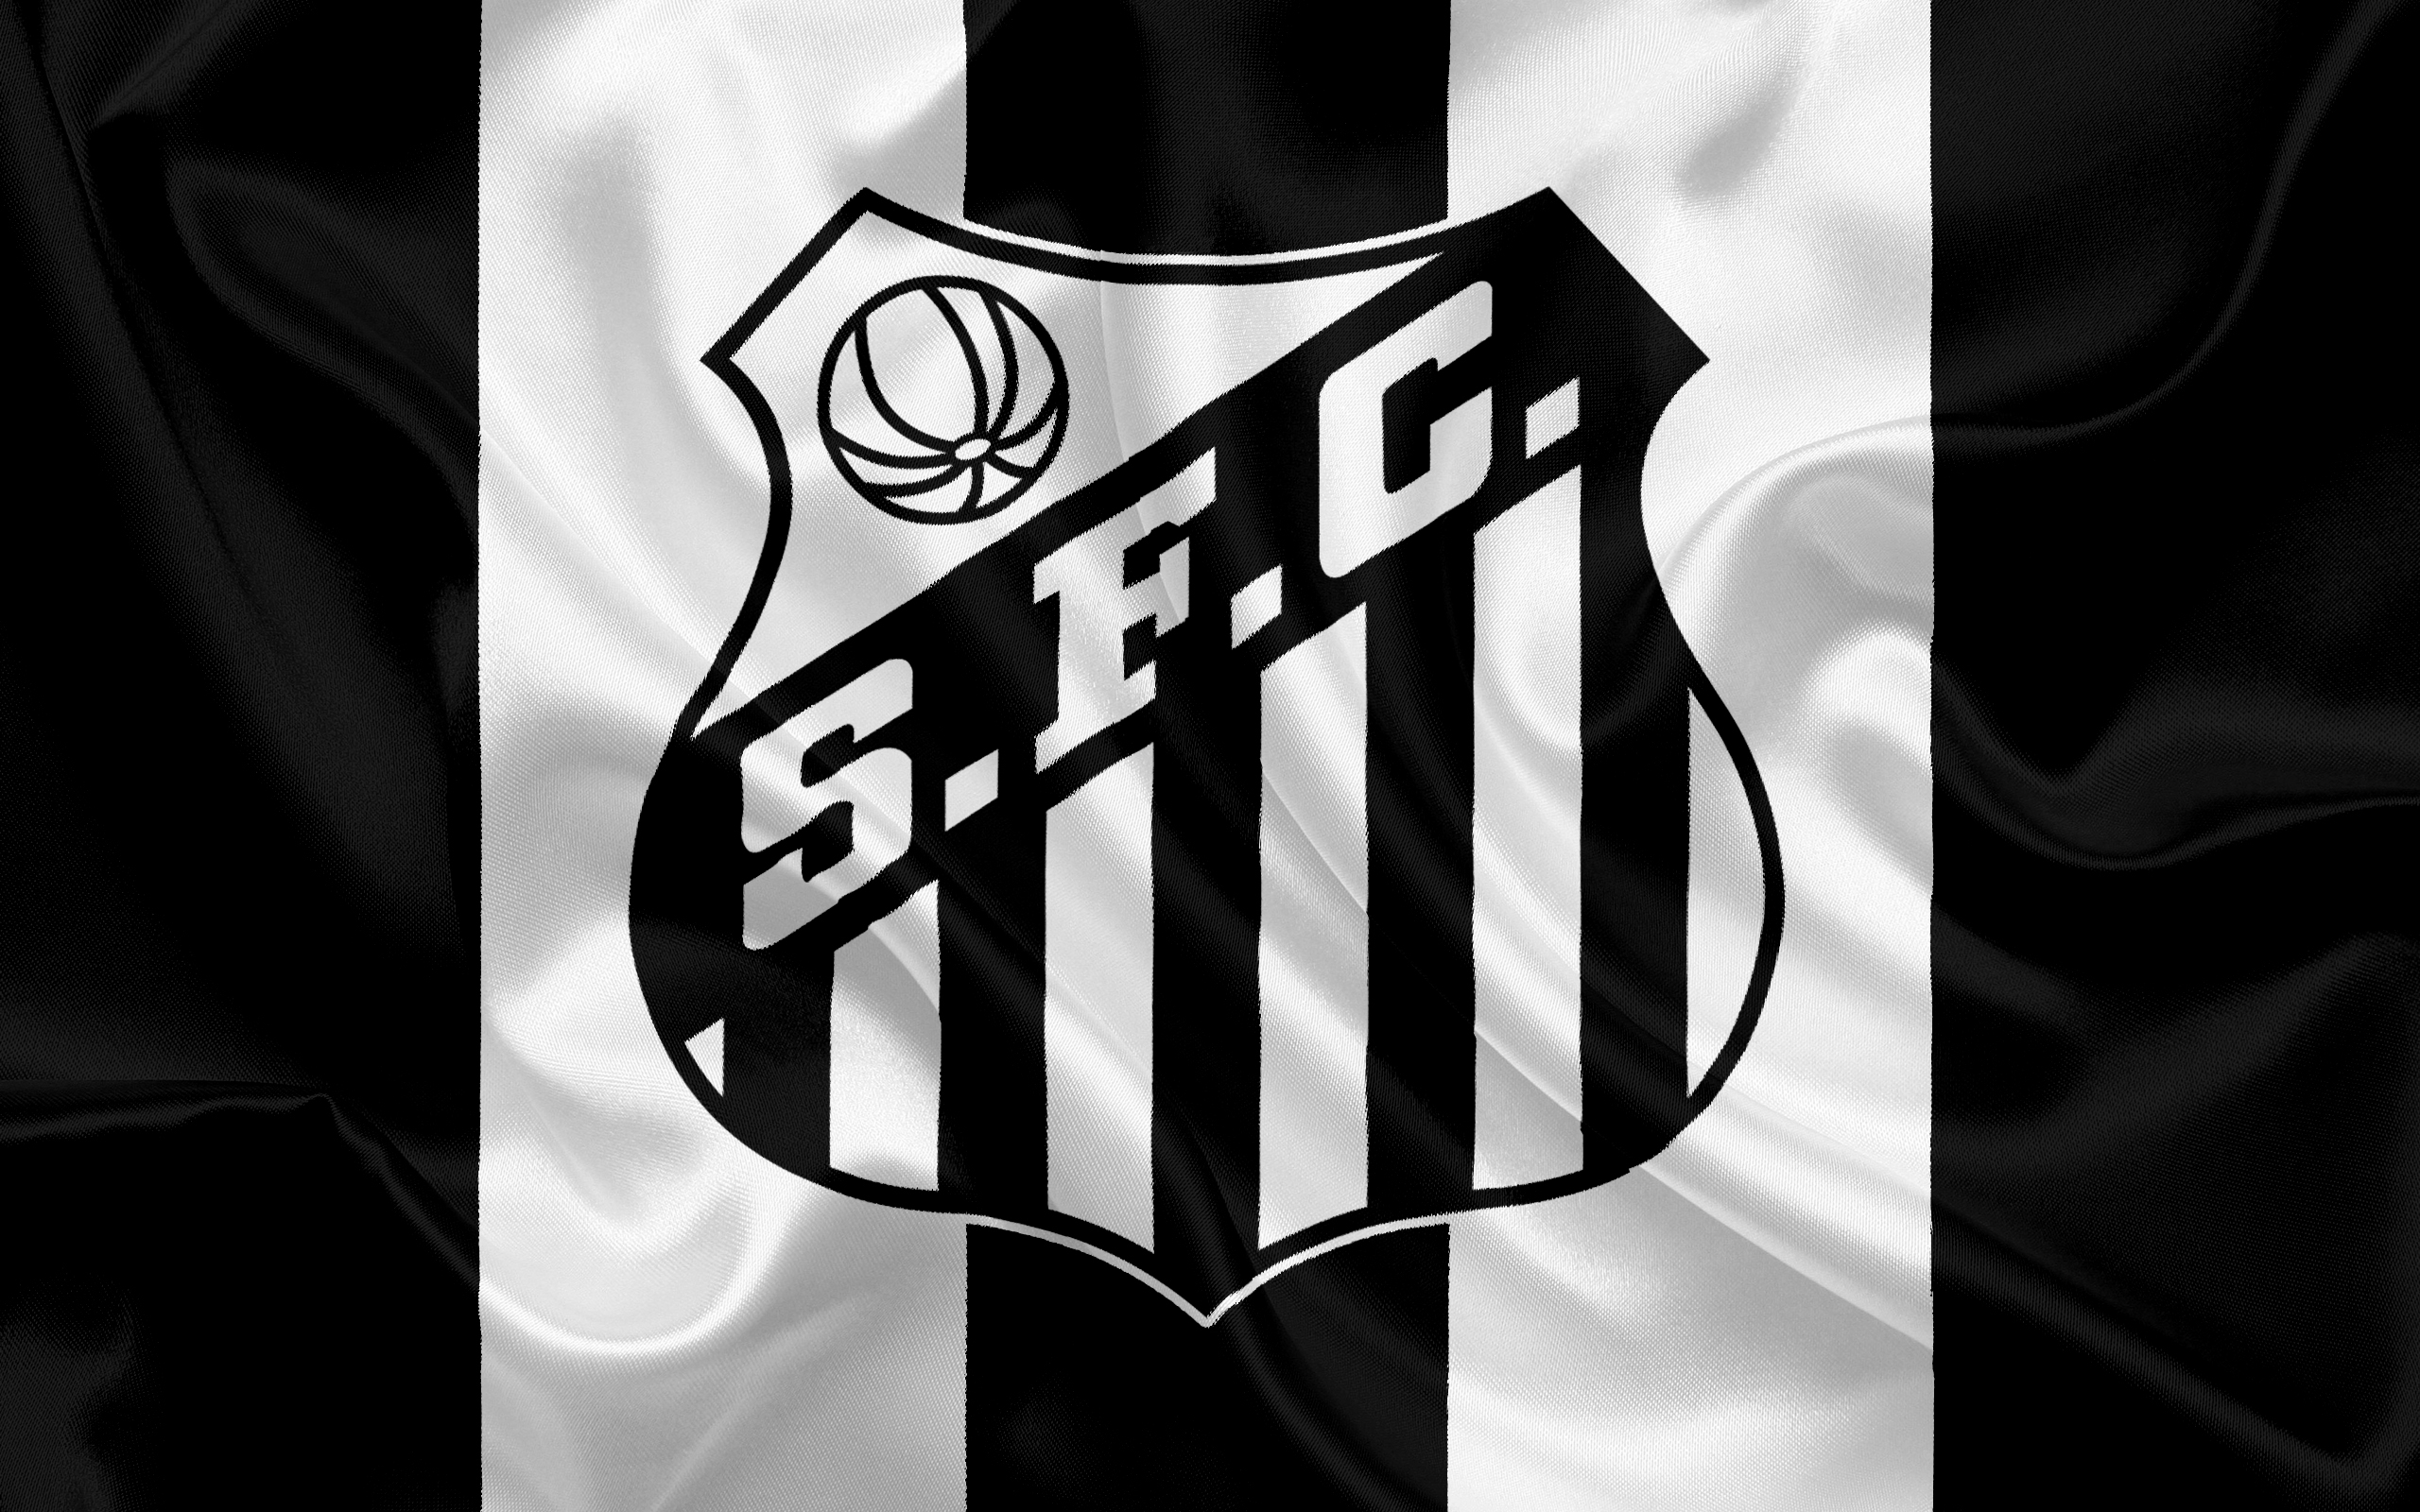 Santos FC HD Wallpaper Background Image 2560x1600 ID985232 2560x1600